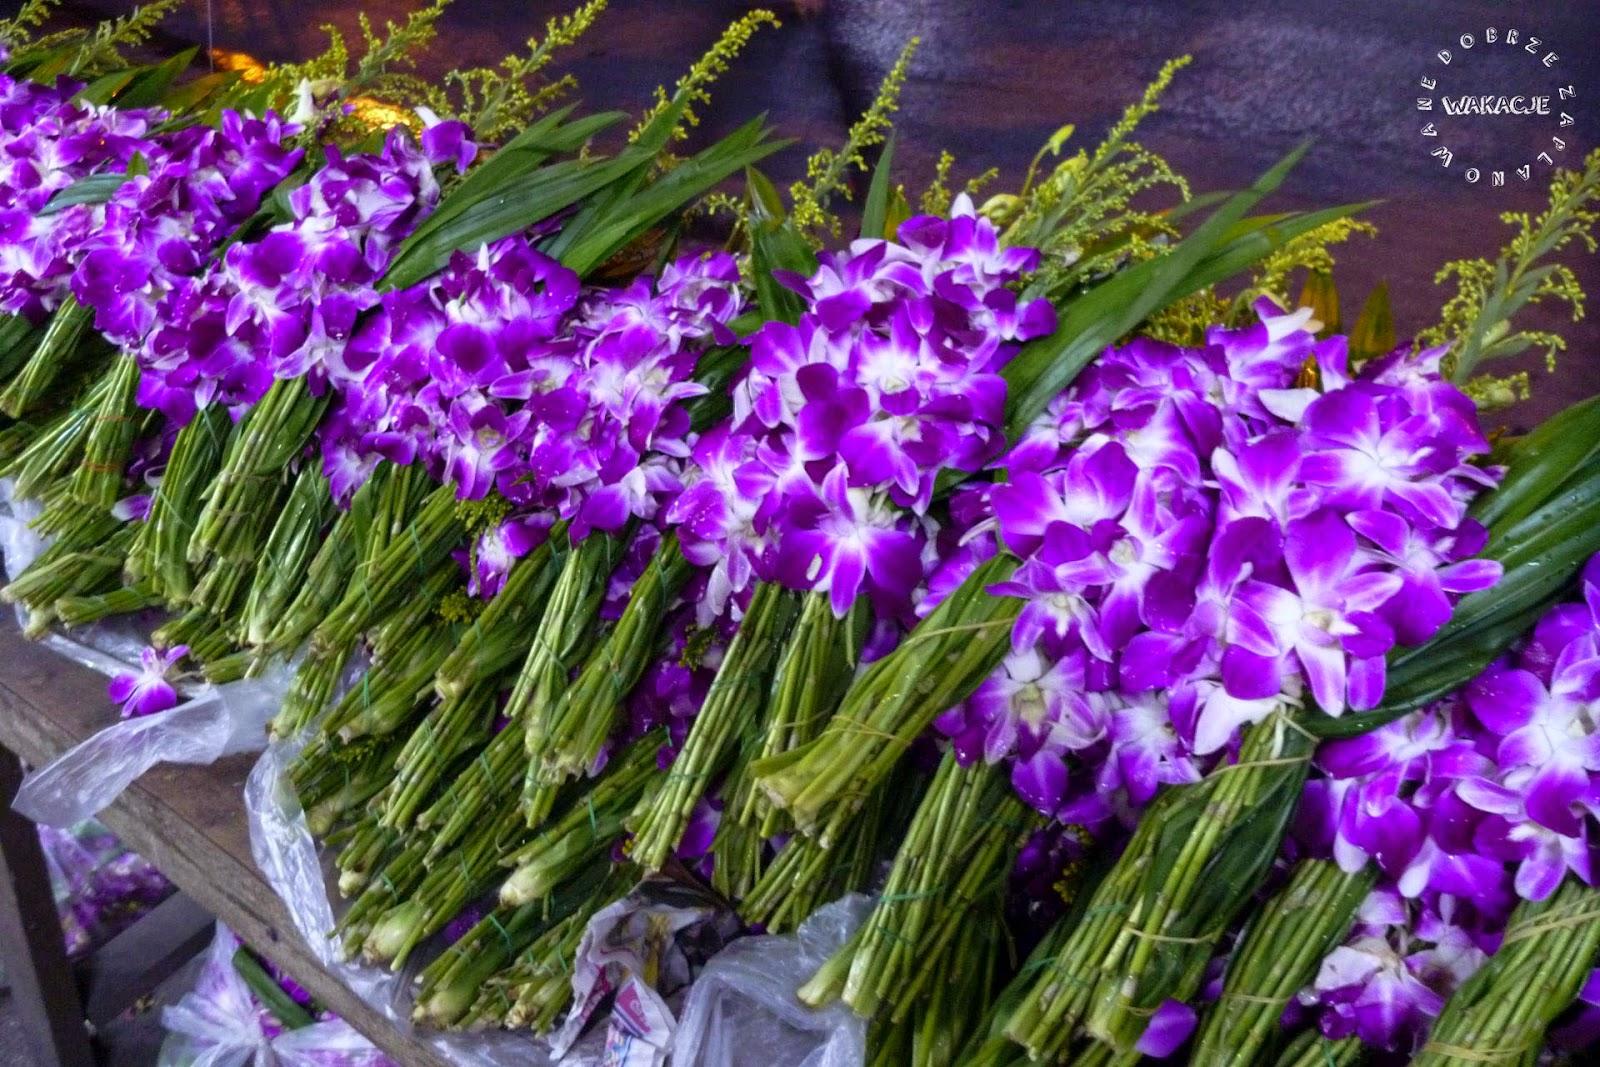 Targ kwiatowy w Bangkoku